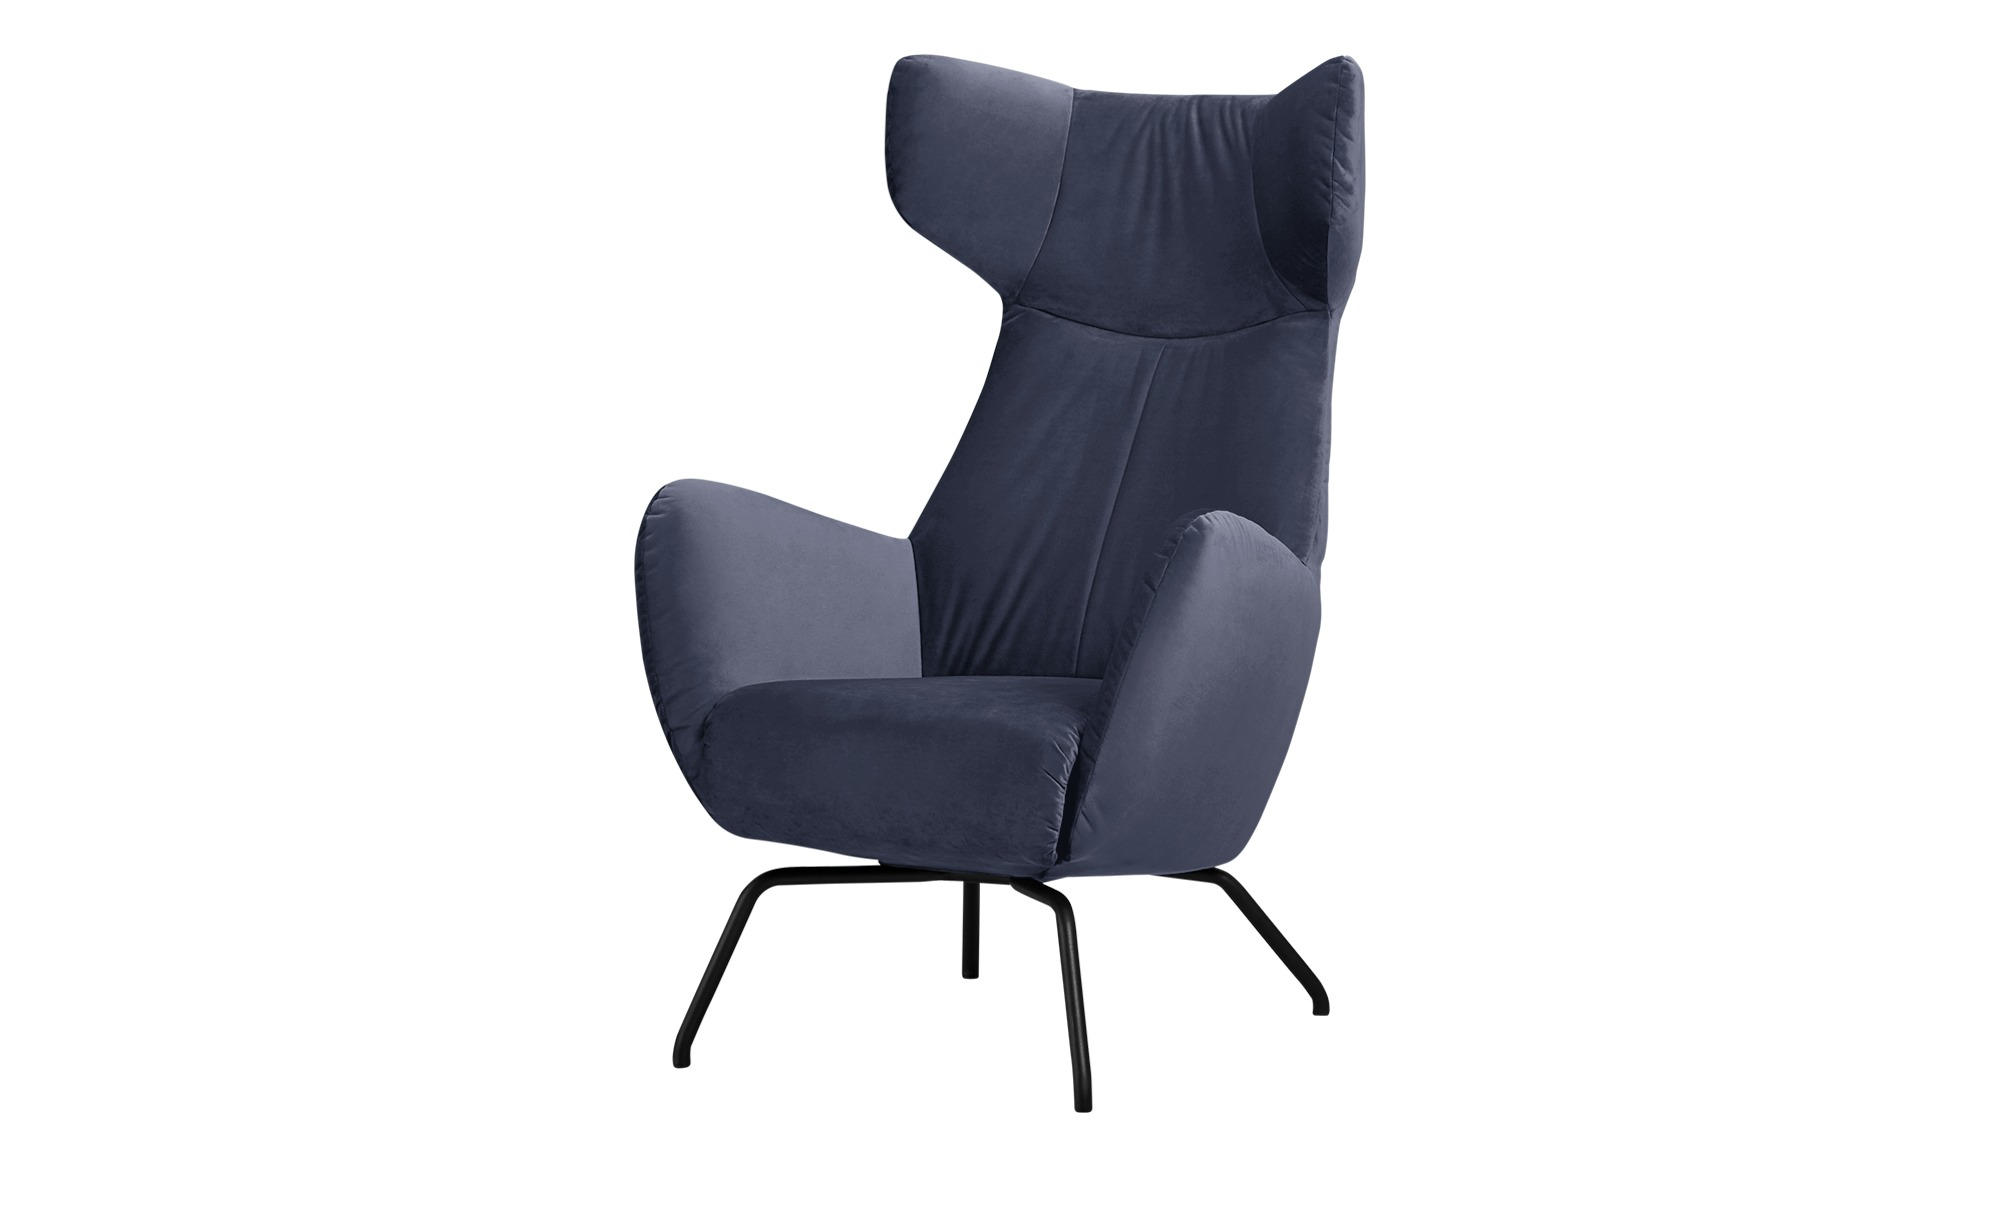 Sessel  Corelli ¦ blau ¦ Maße (cm): B: 79 H: 117 T: 82 Polstermöbel > Sessel > Polstersessel - Höffner